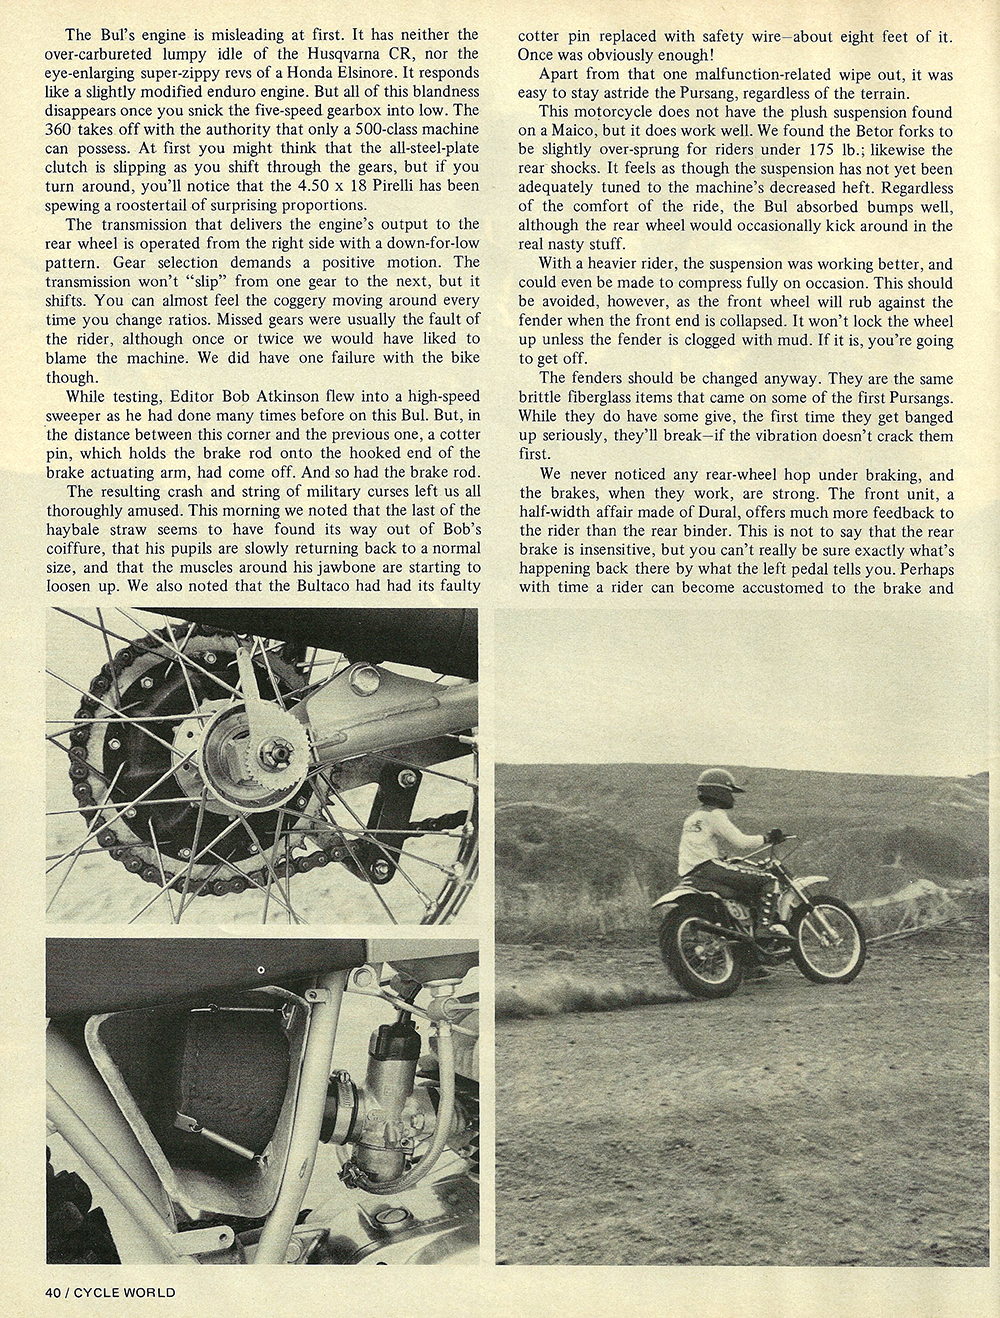 1974 Bultaco 352 Pomeroy road test 05.jpg